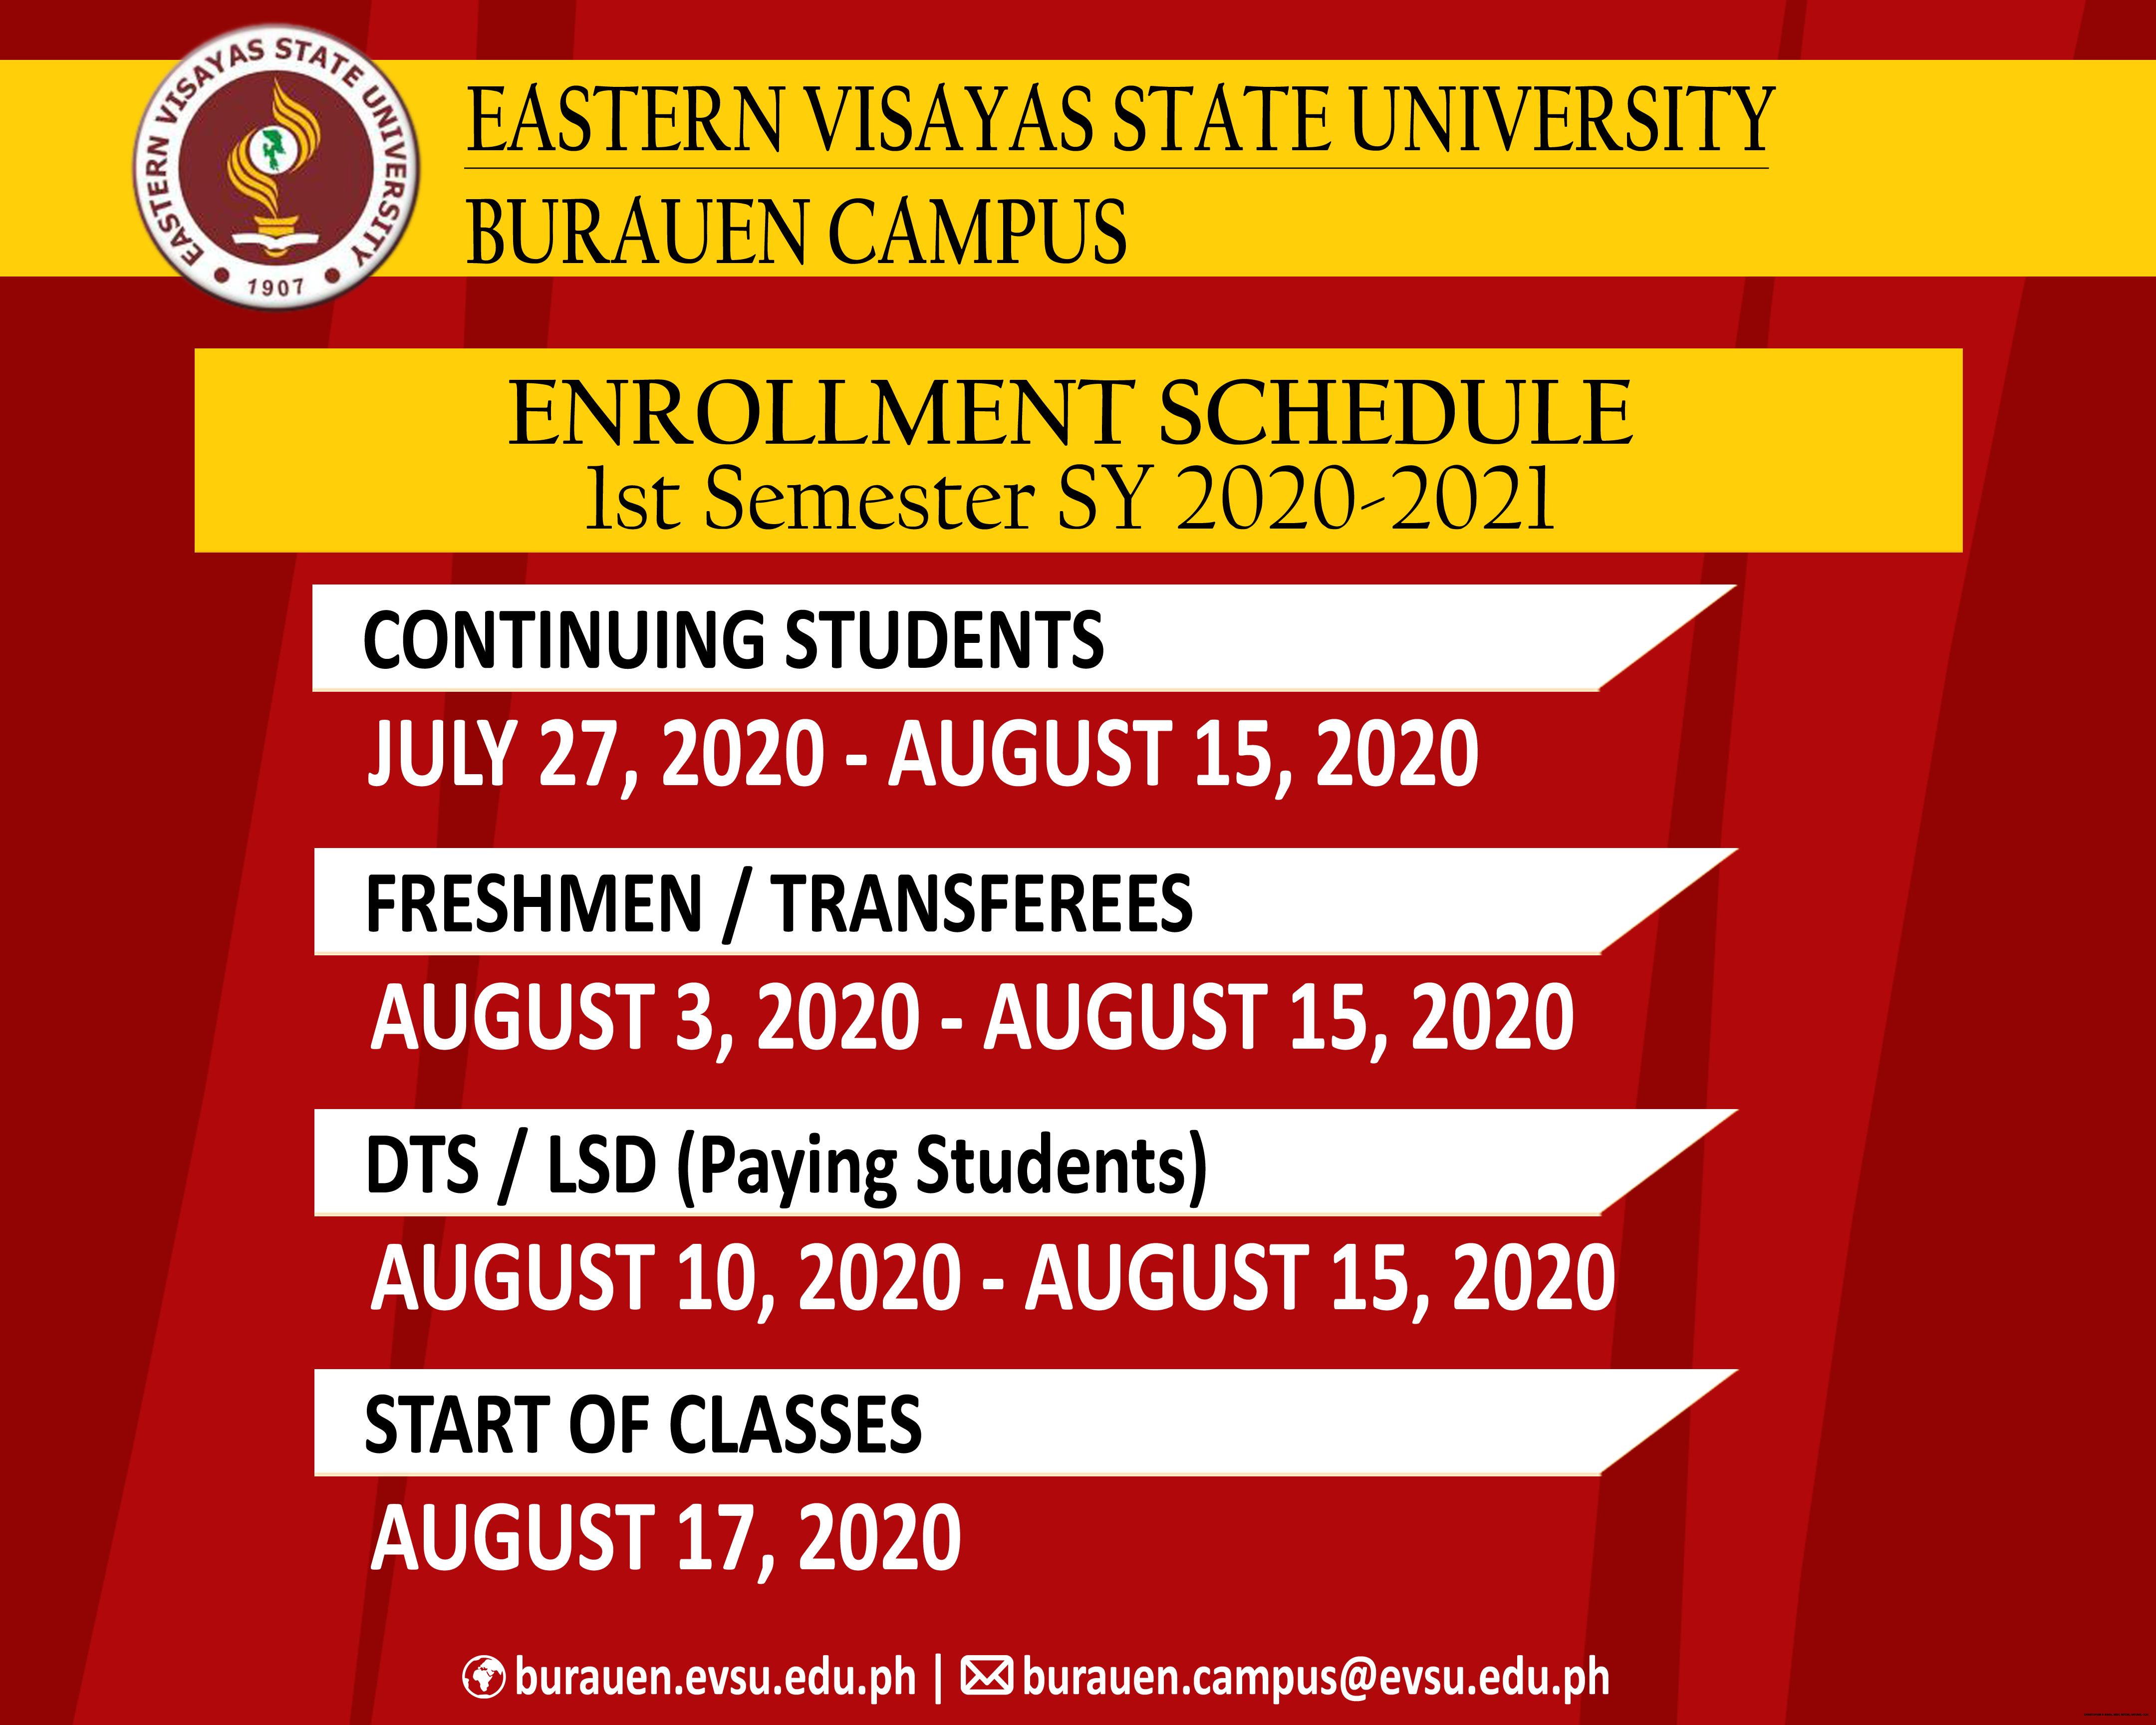 EVSU-BC Enrollment Schedule for 1st Semester SY 2020-2021 ...